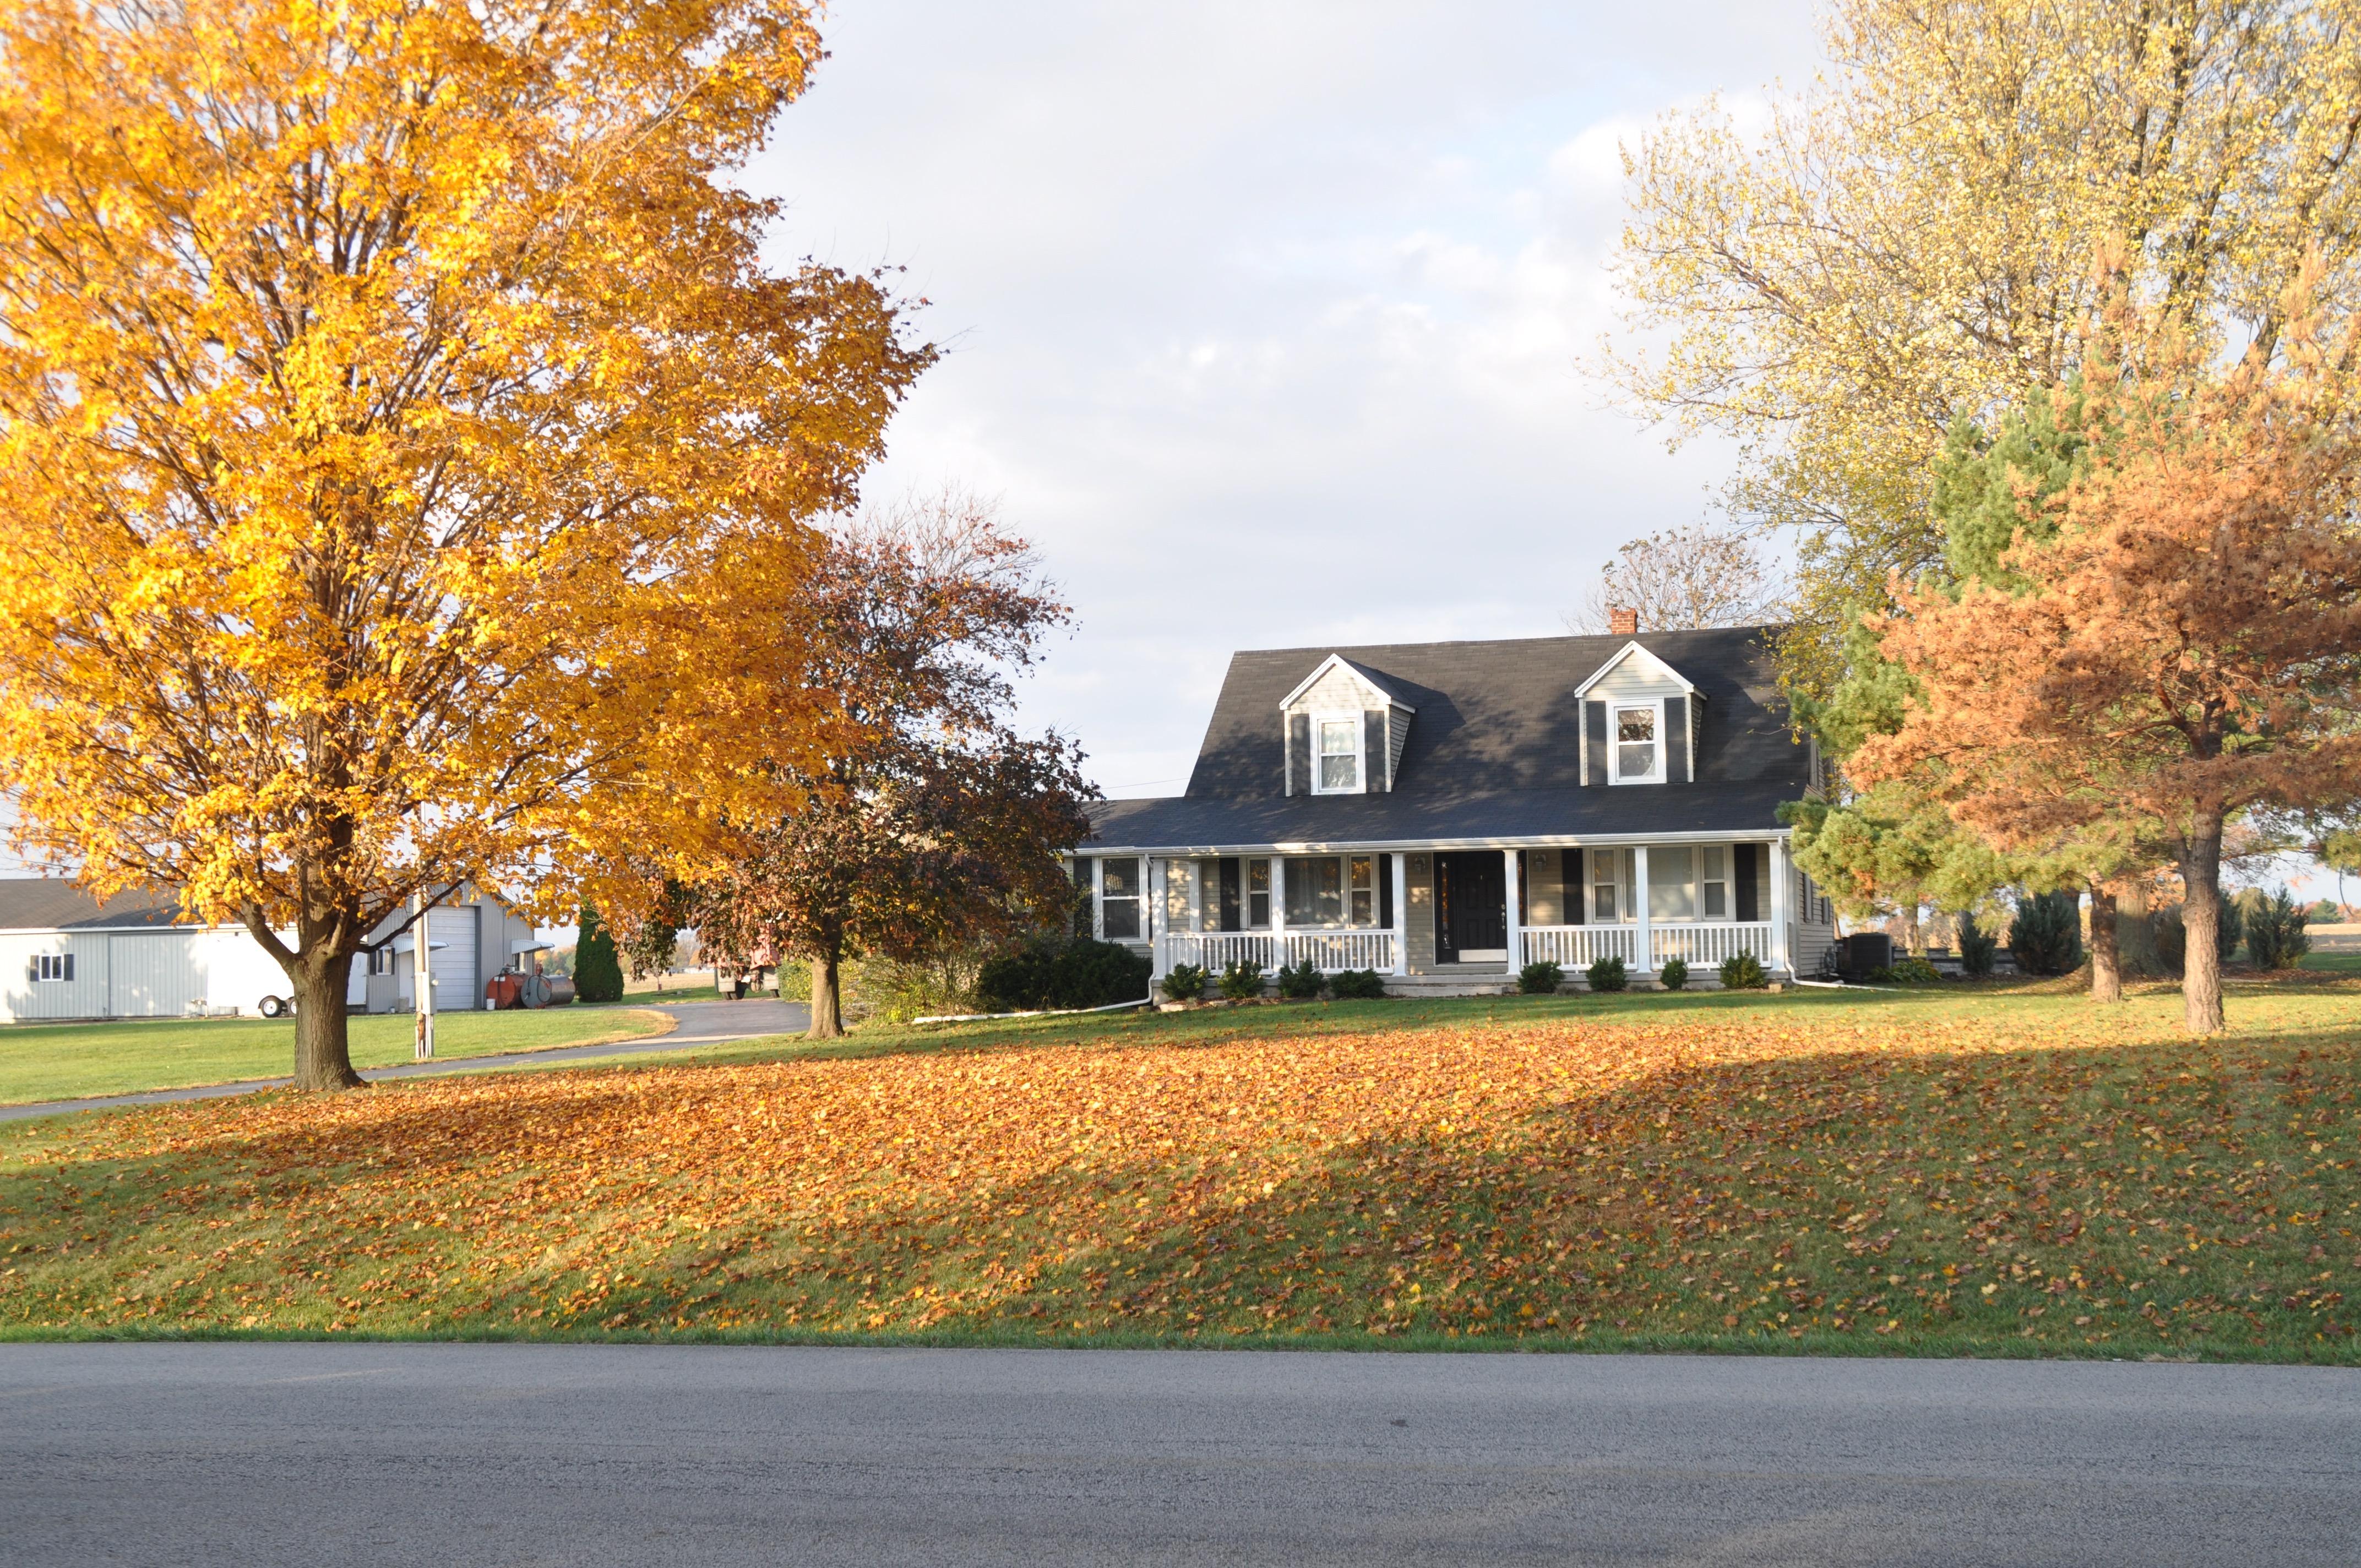 1524 Candy Lane, Macomb, Illinois 61455